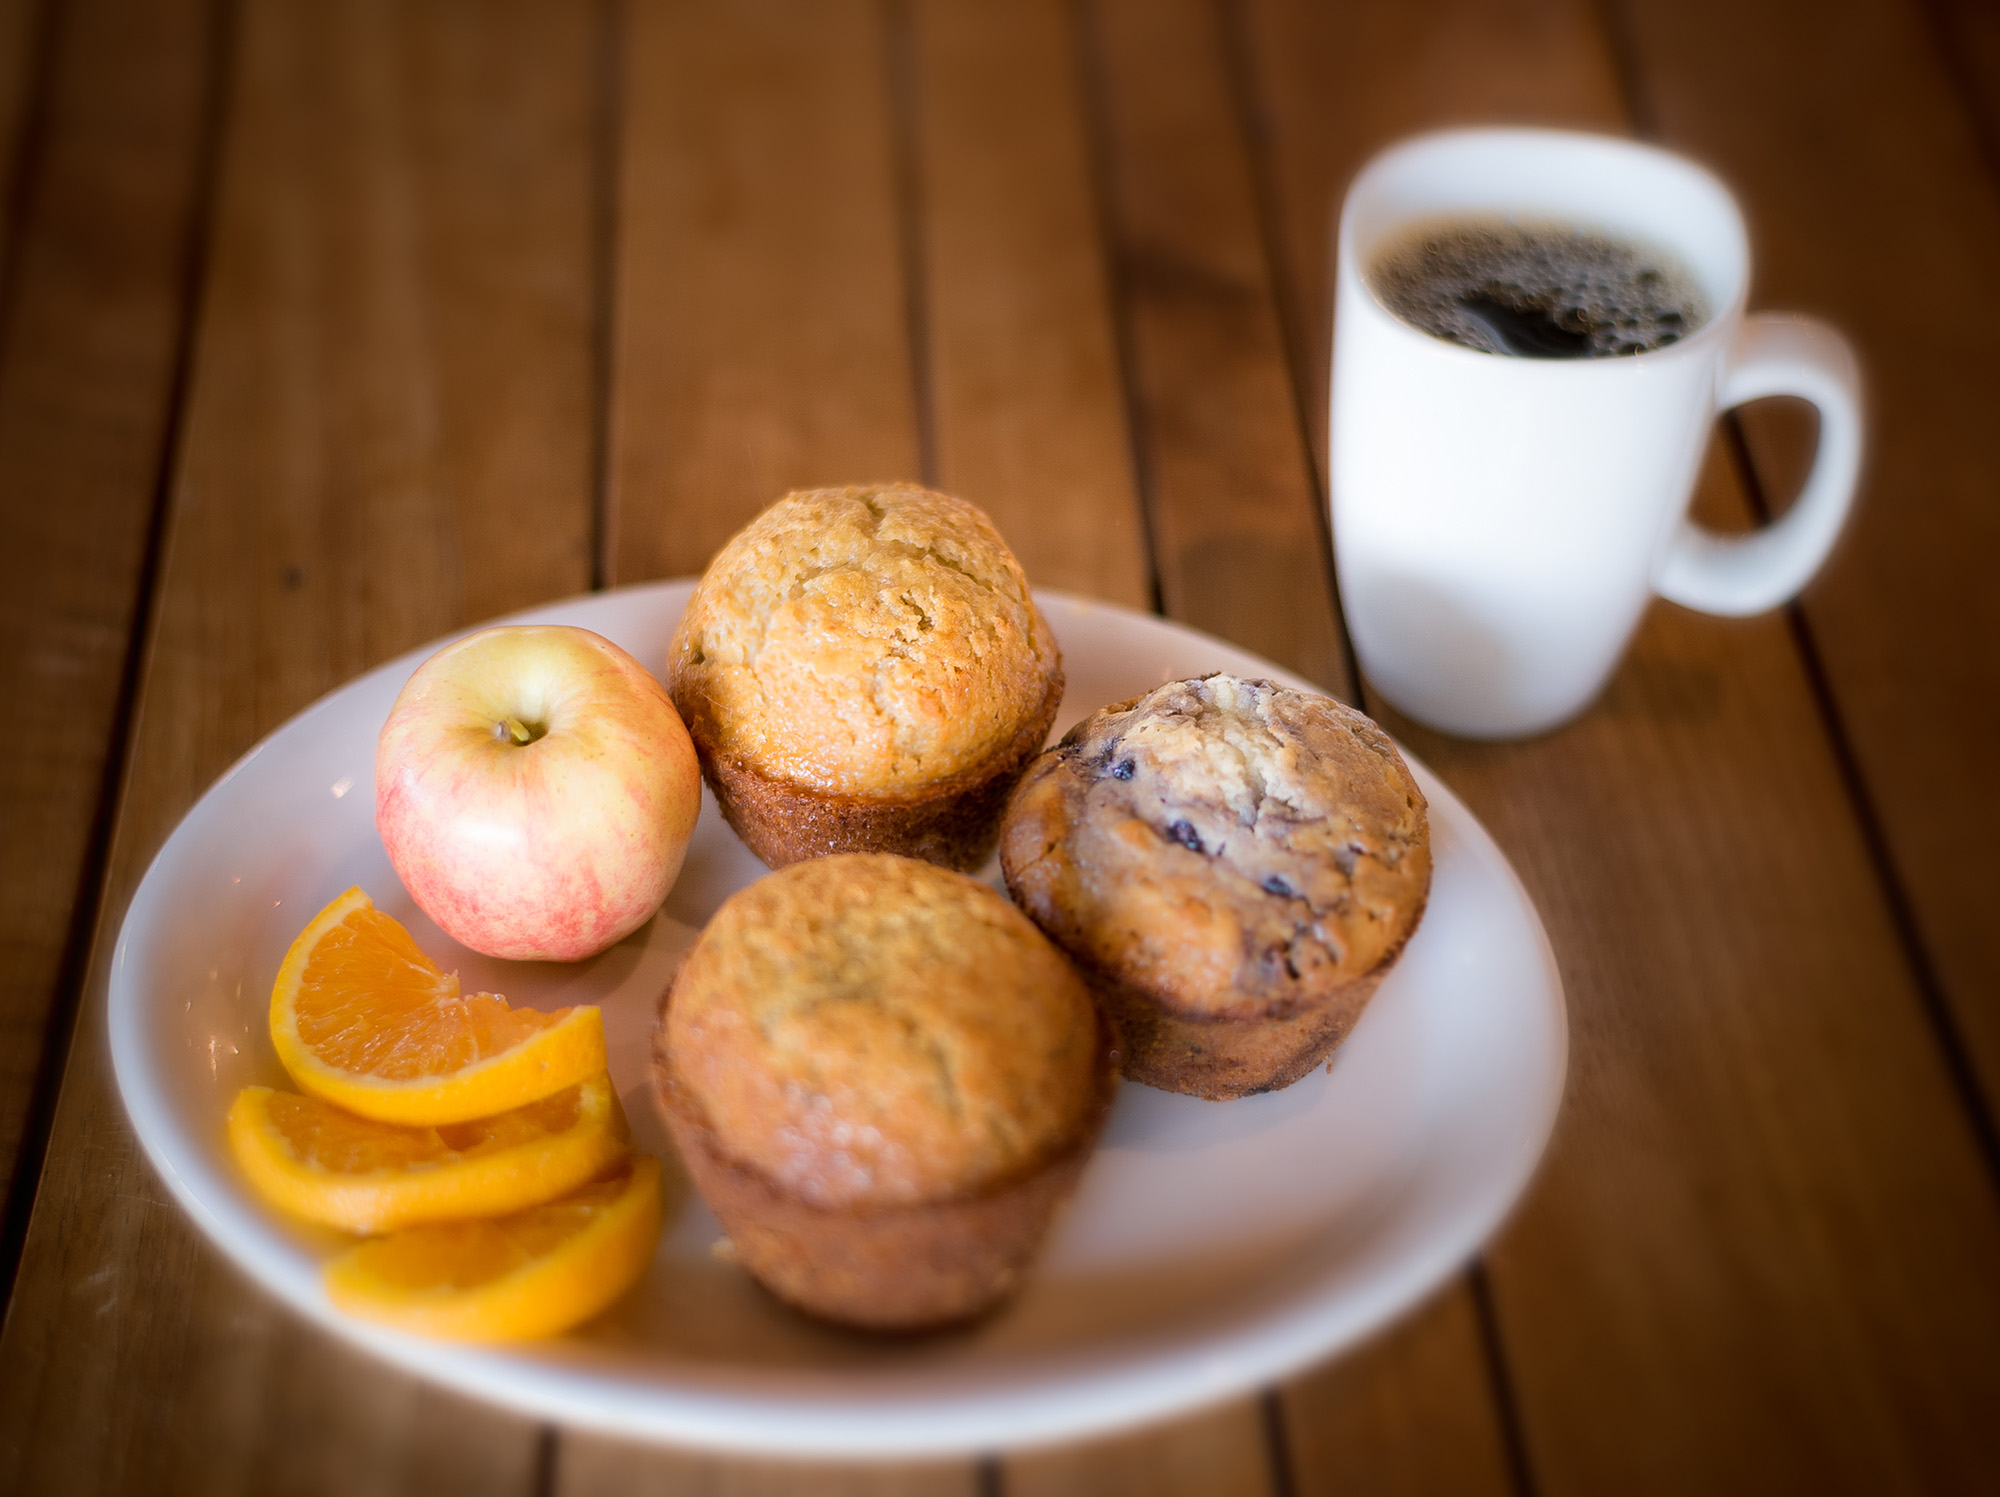 Blueberry Muffin and Lemon Poppyseed muffins